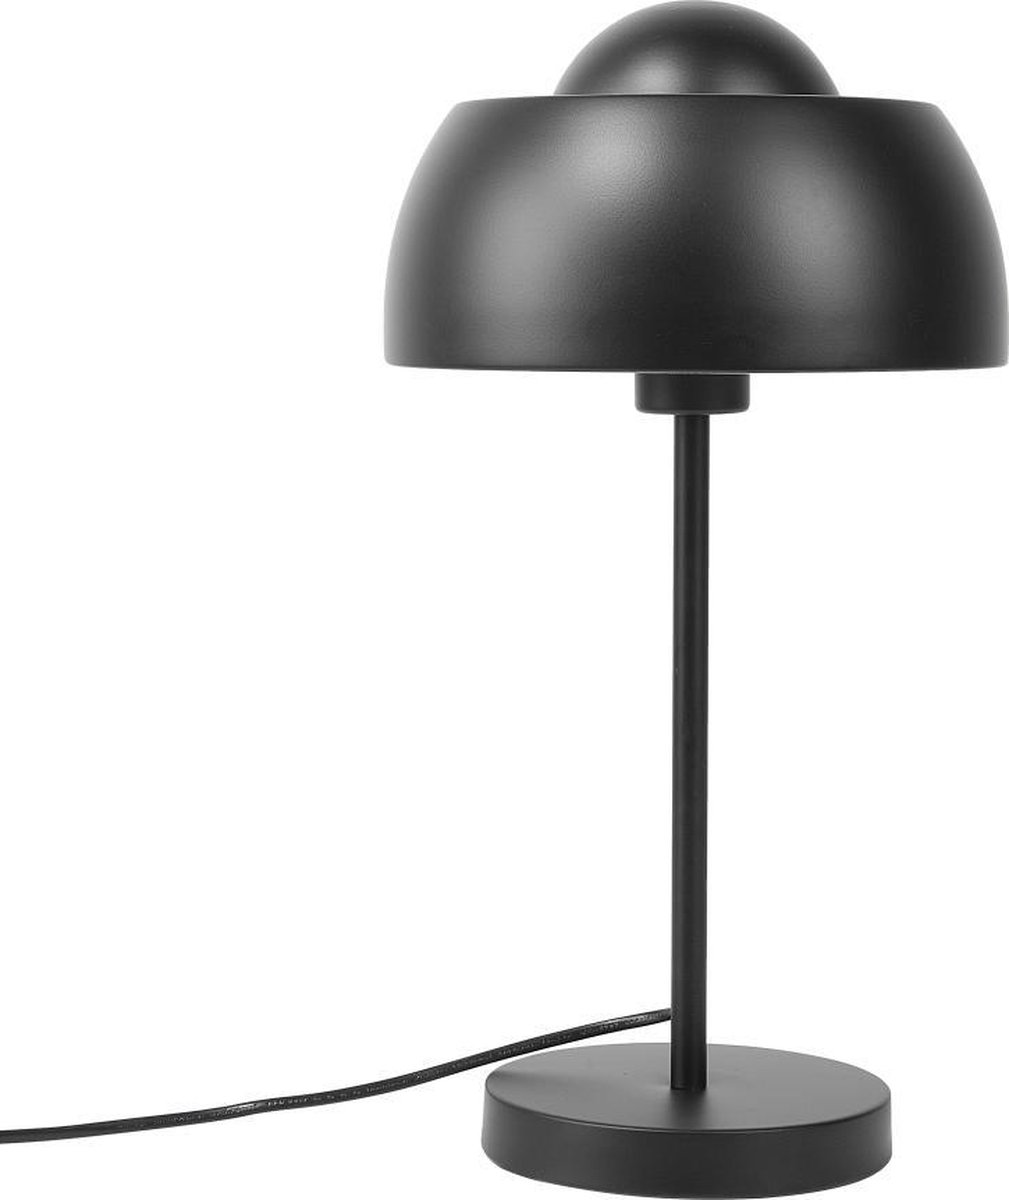 Beliani SENETTE Tafellamp Zwart Metaal